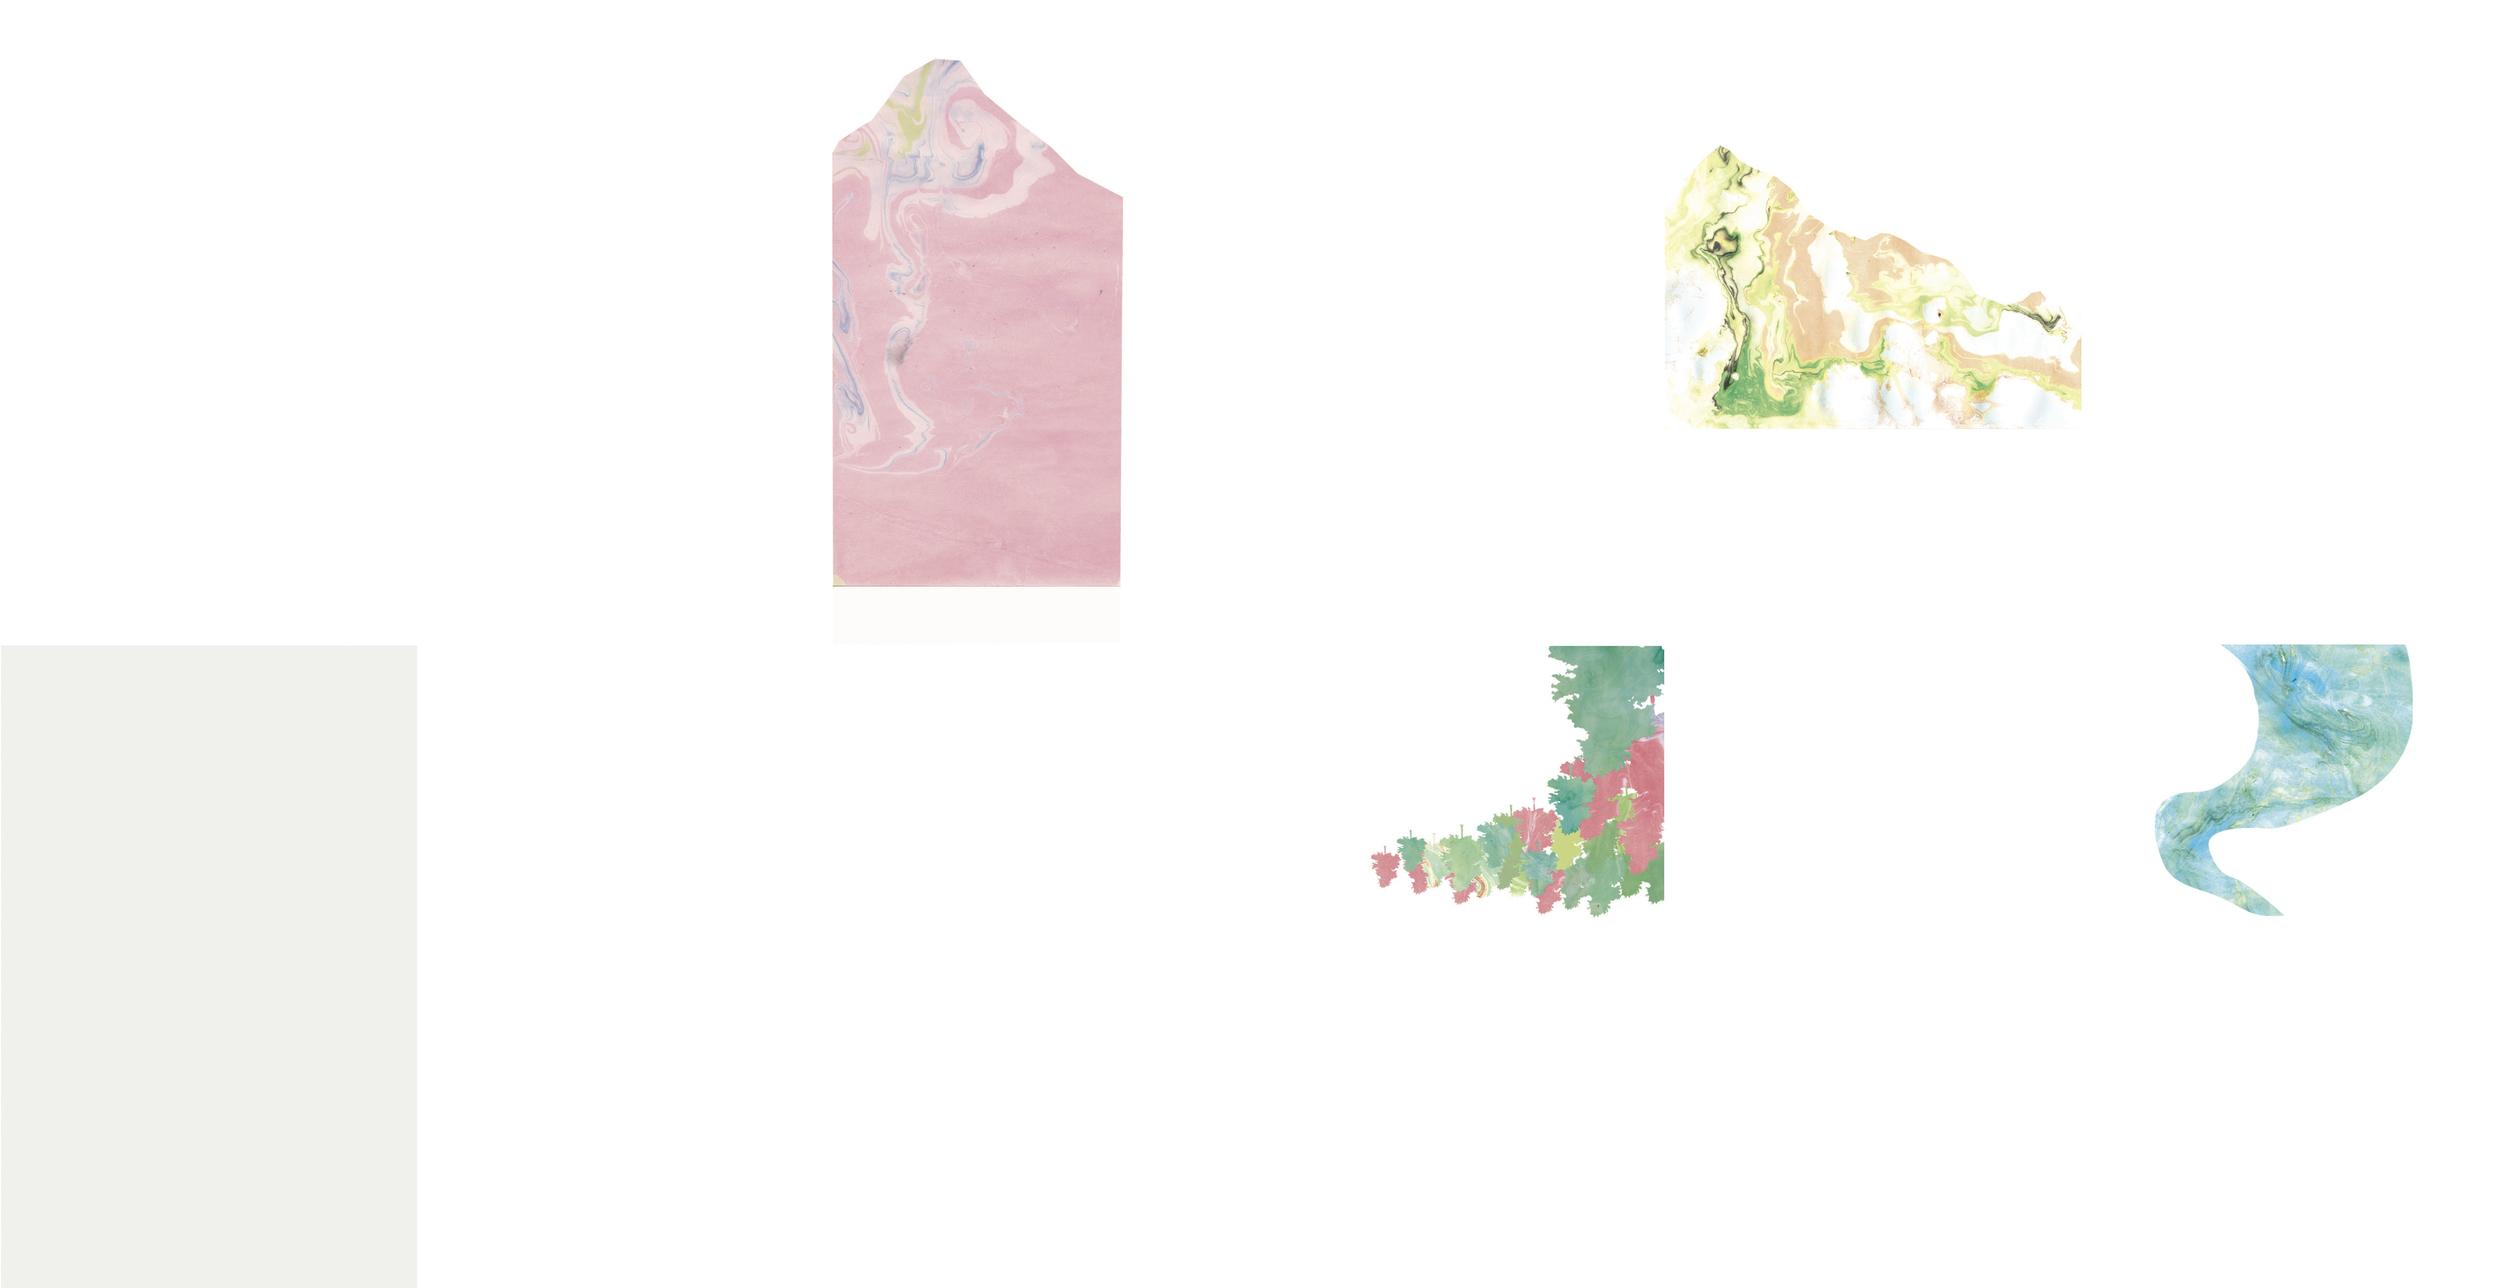 Digital Imaging 4 - Unfolding narrative_Page_1.jpg